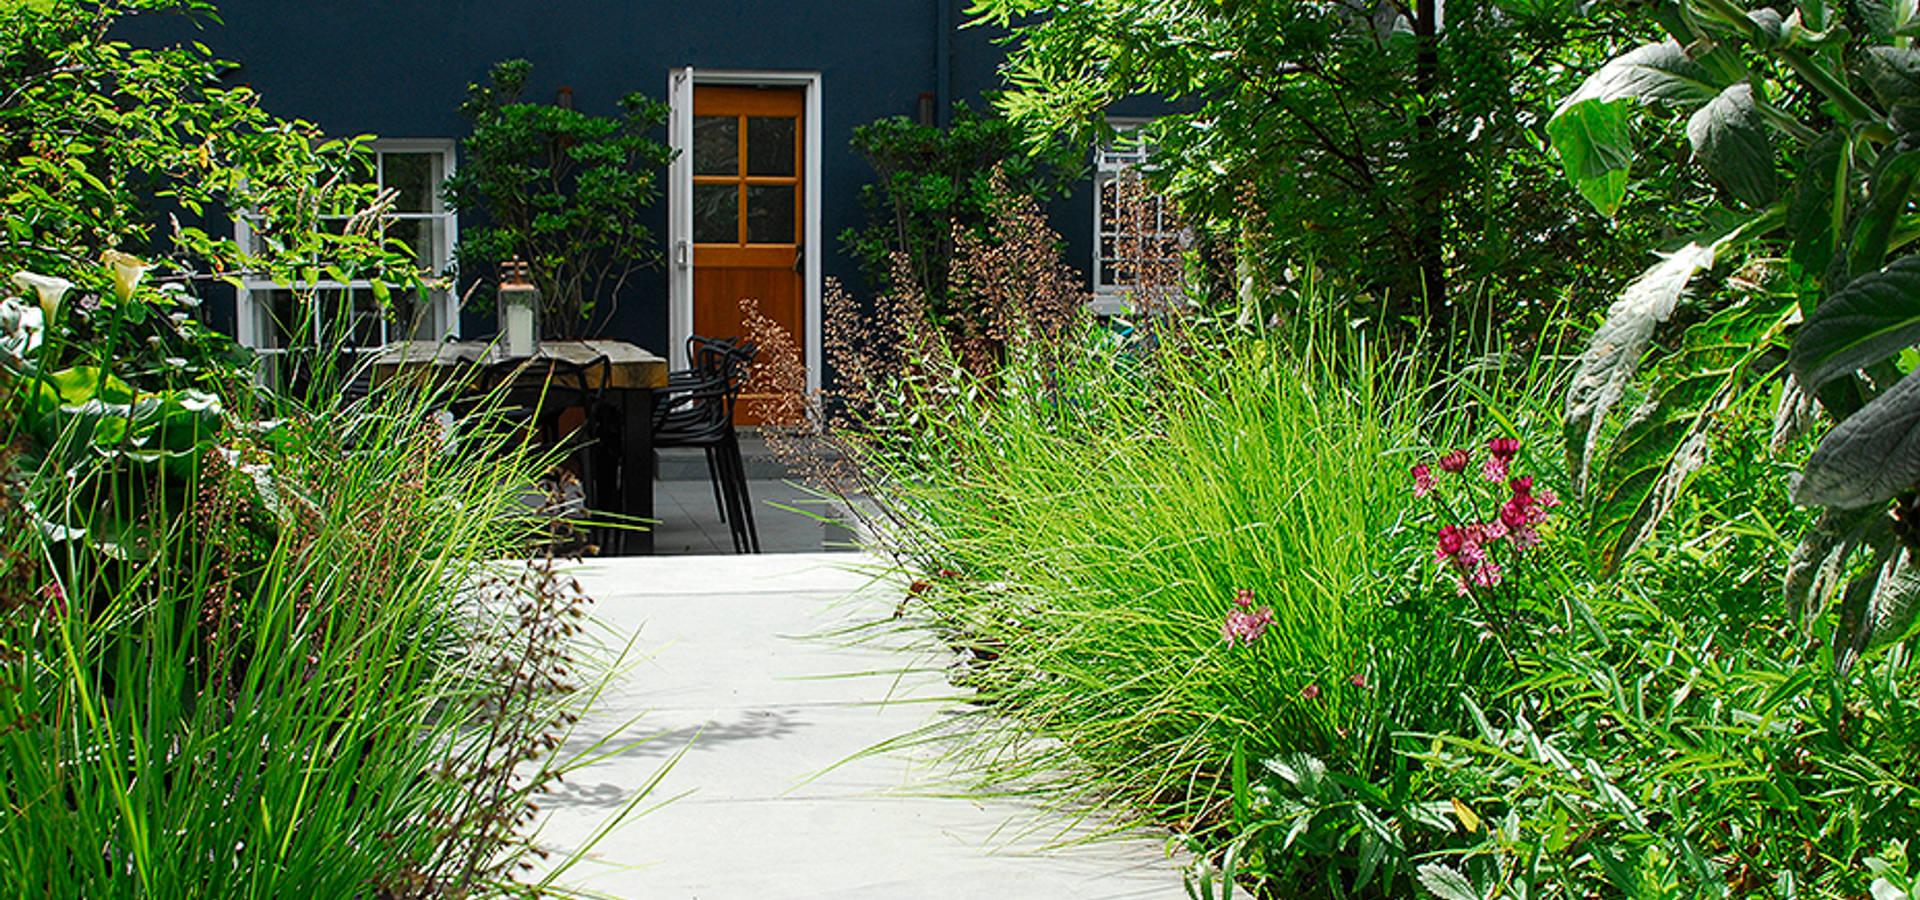 Josh ward garden design tuinartikelen in london homify for Garden design 1920 s